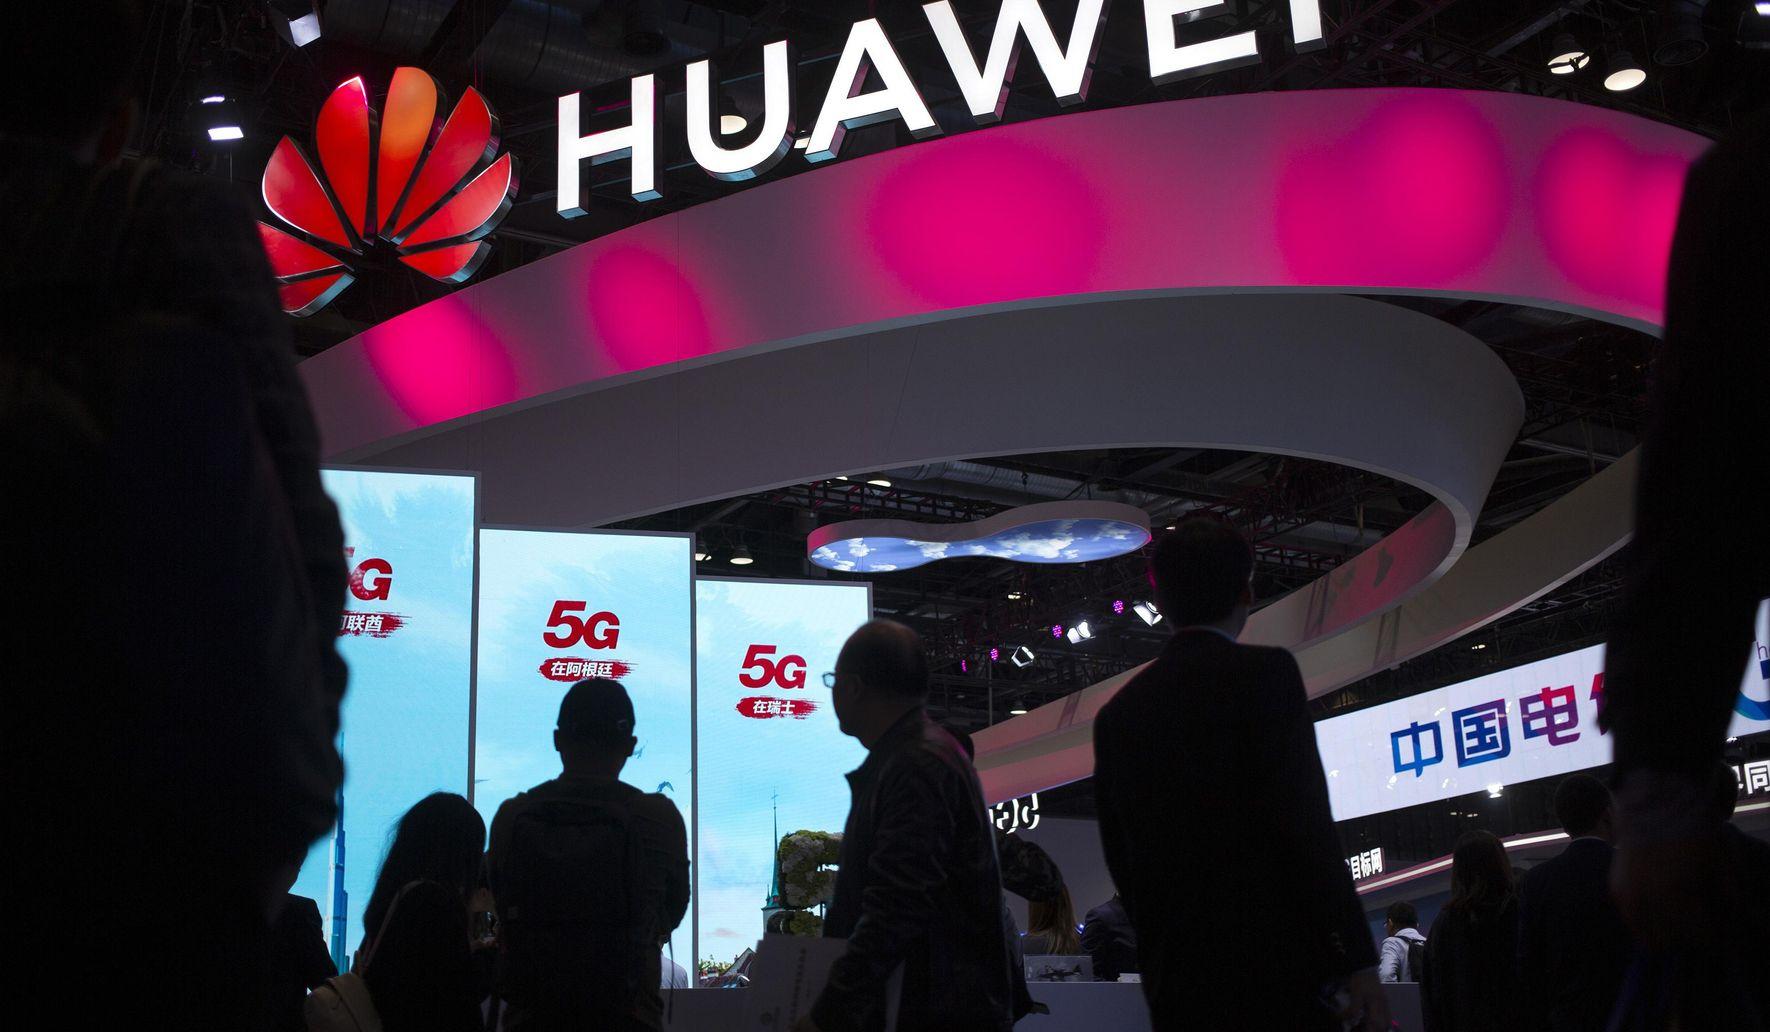 Image of article 'China's Huawei warns more US pressure may spur retaliation'